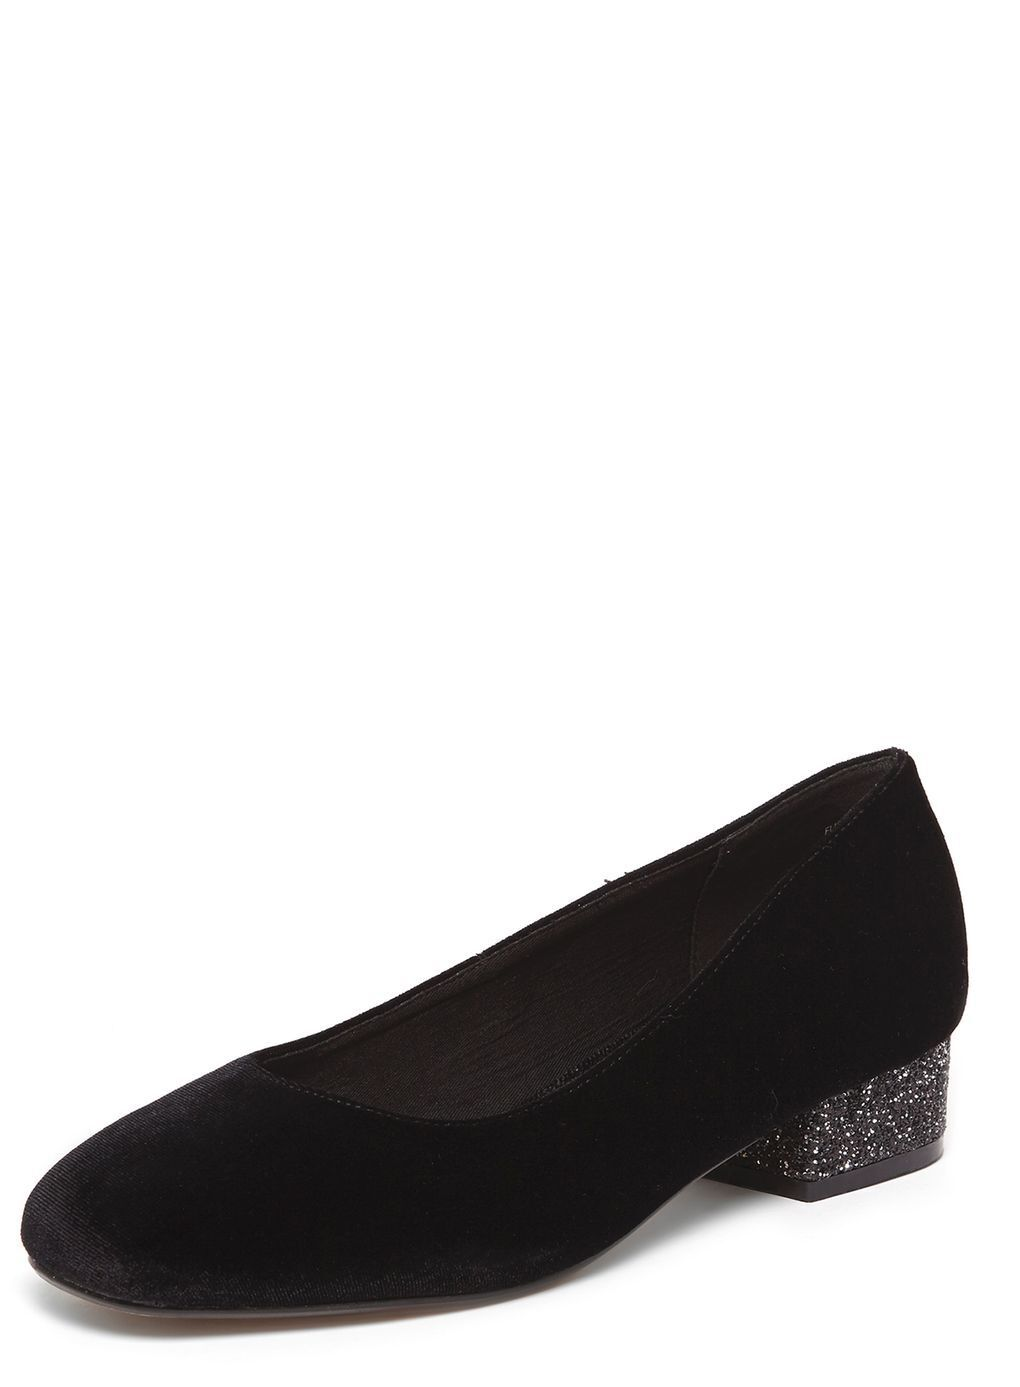 Evans FLISS Black Glitter Block Heel Court shoes UK 8 EU 41 EEE Fit JS45 94 SALEx